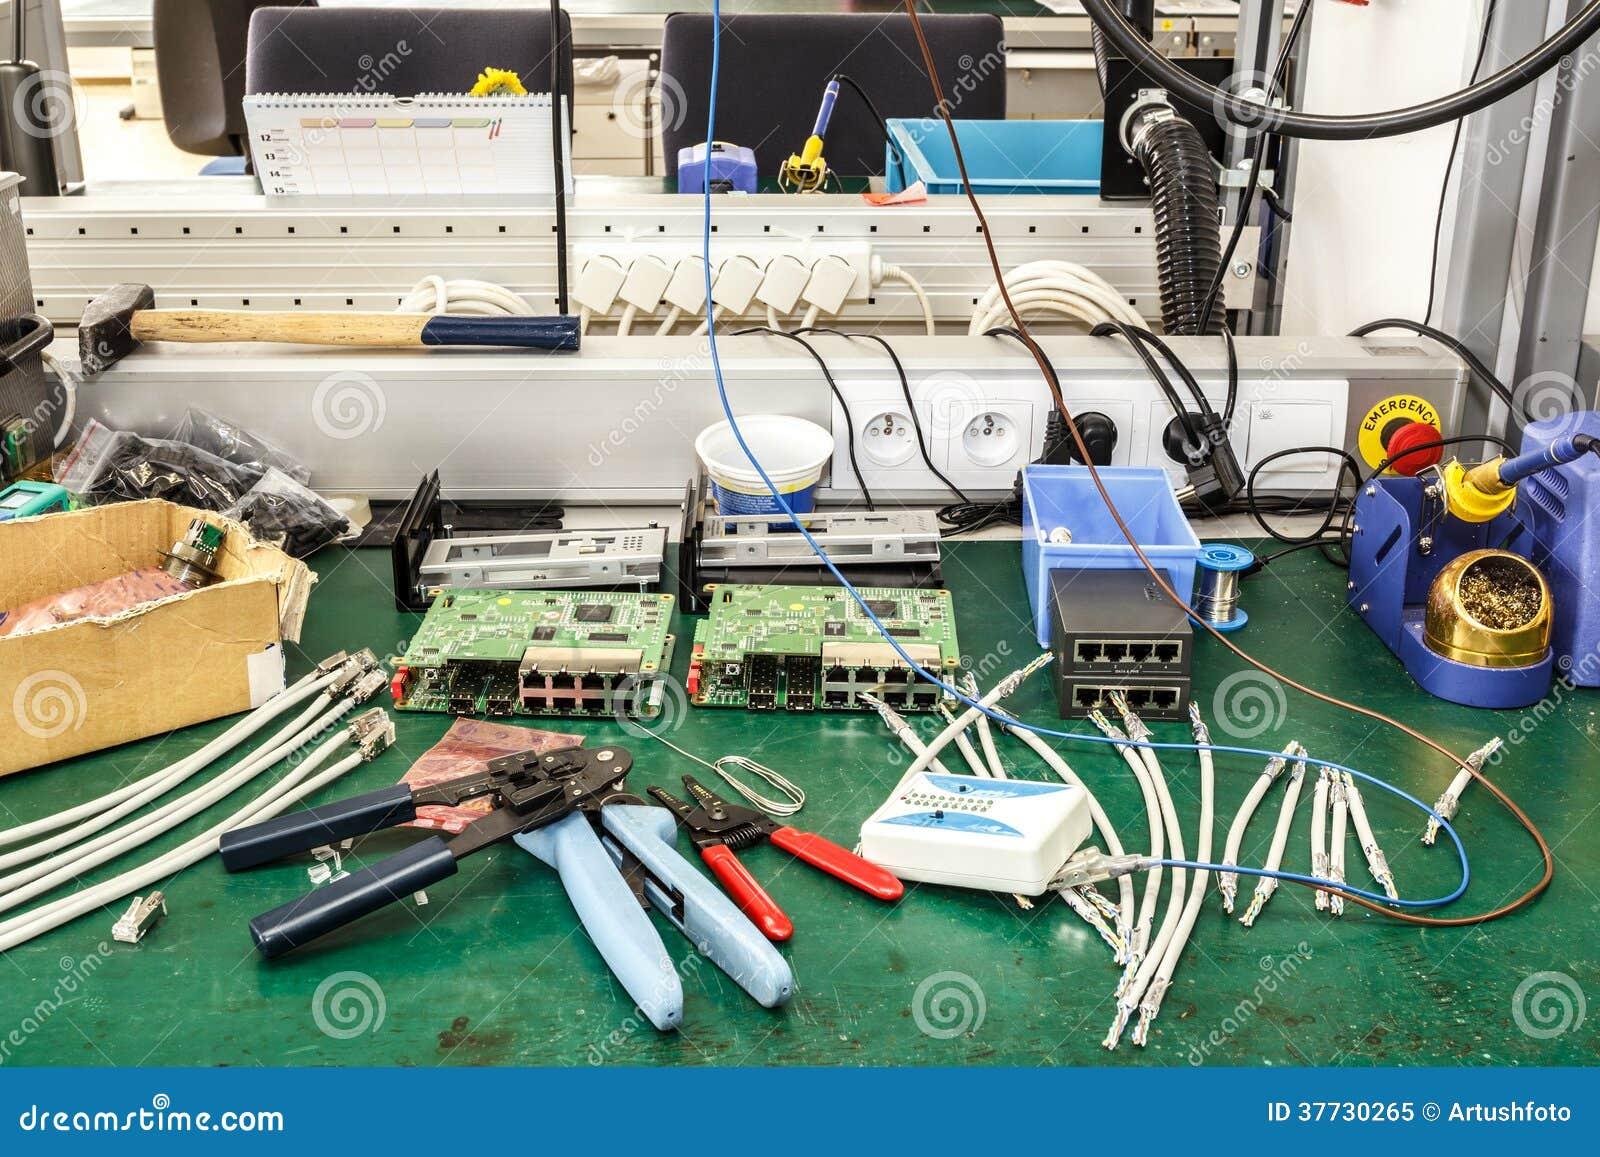 Electronic Assembly Tools : Electronics factory equipment stock photo cartoondealer